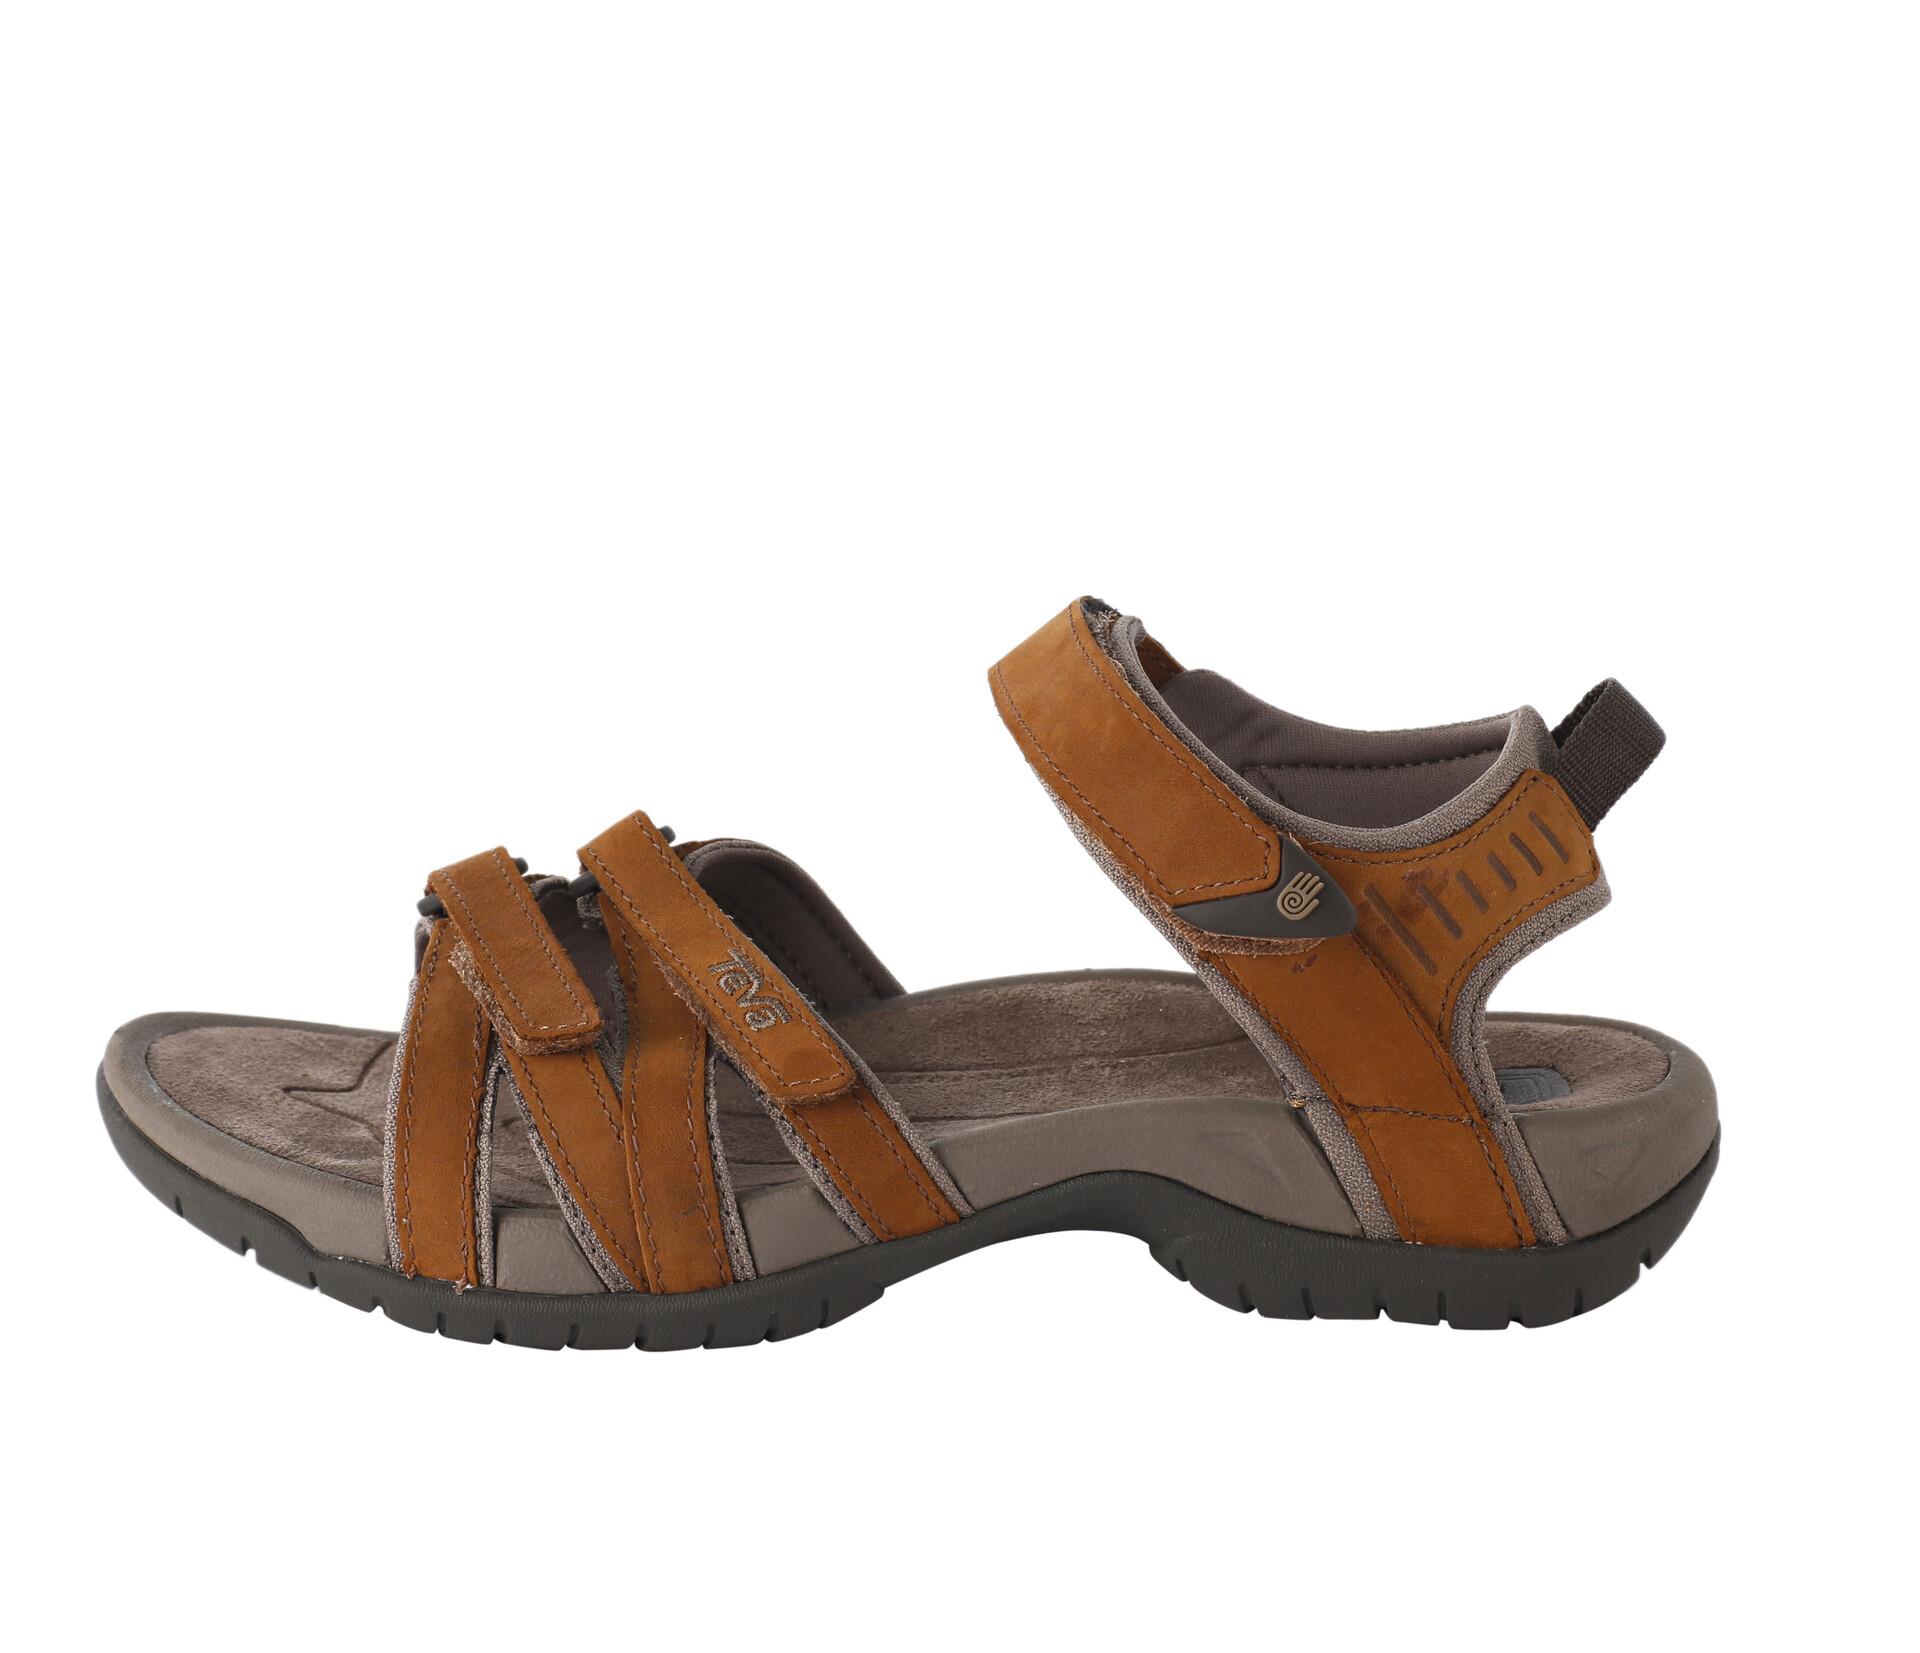 Teva Tirra Leather Sandals Damen rust